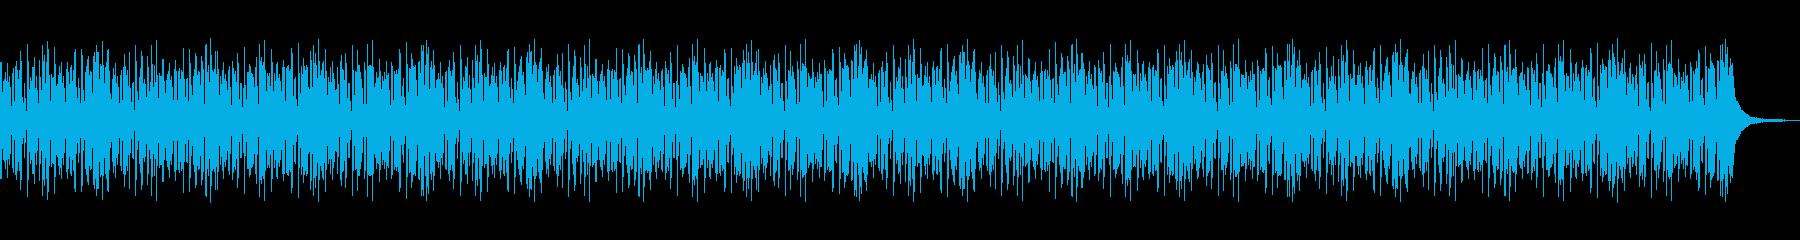 YouTube・トーク・Bossa・軽快の再生済みの波形